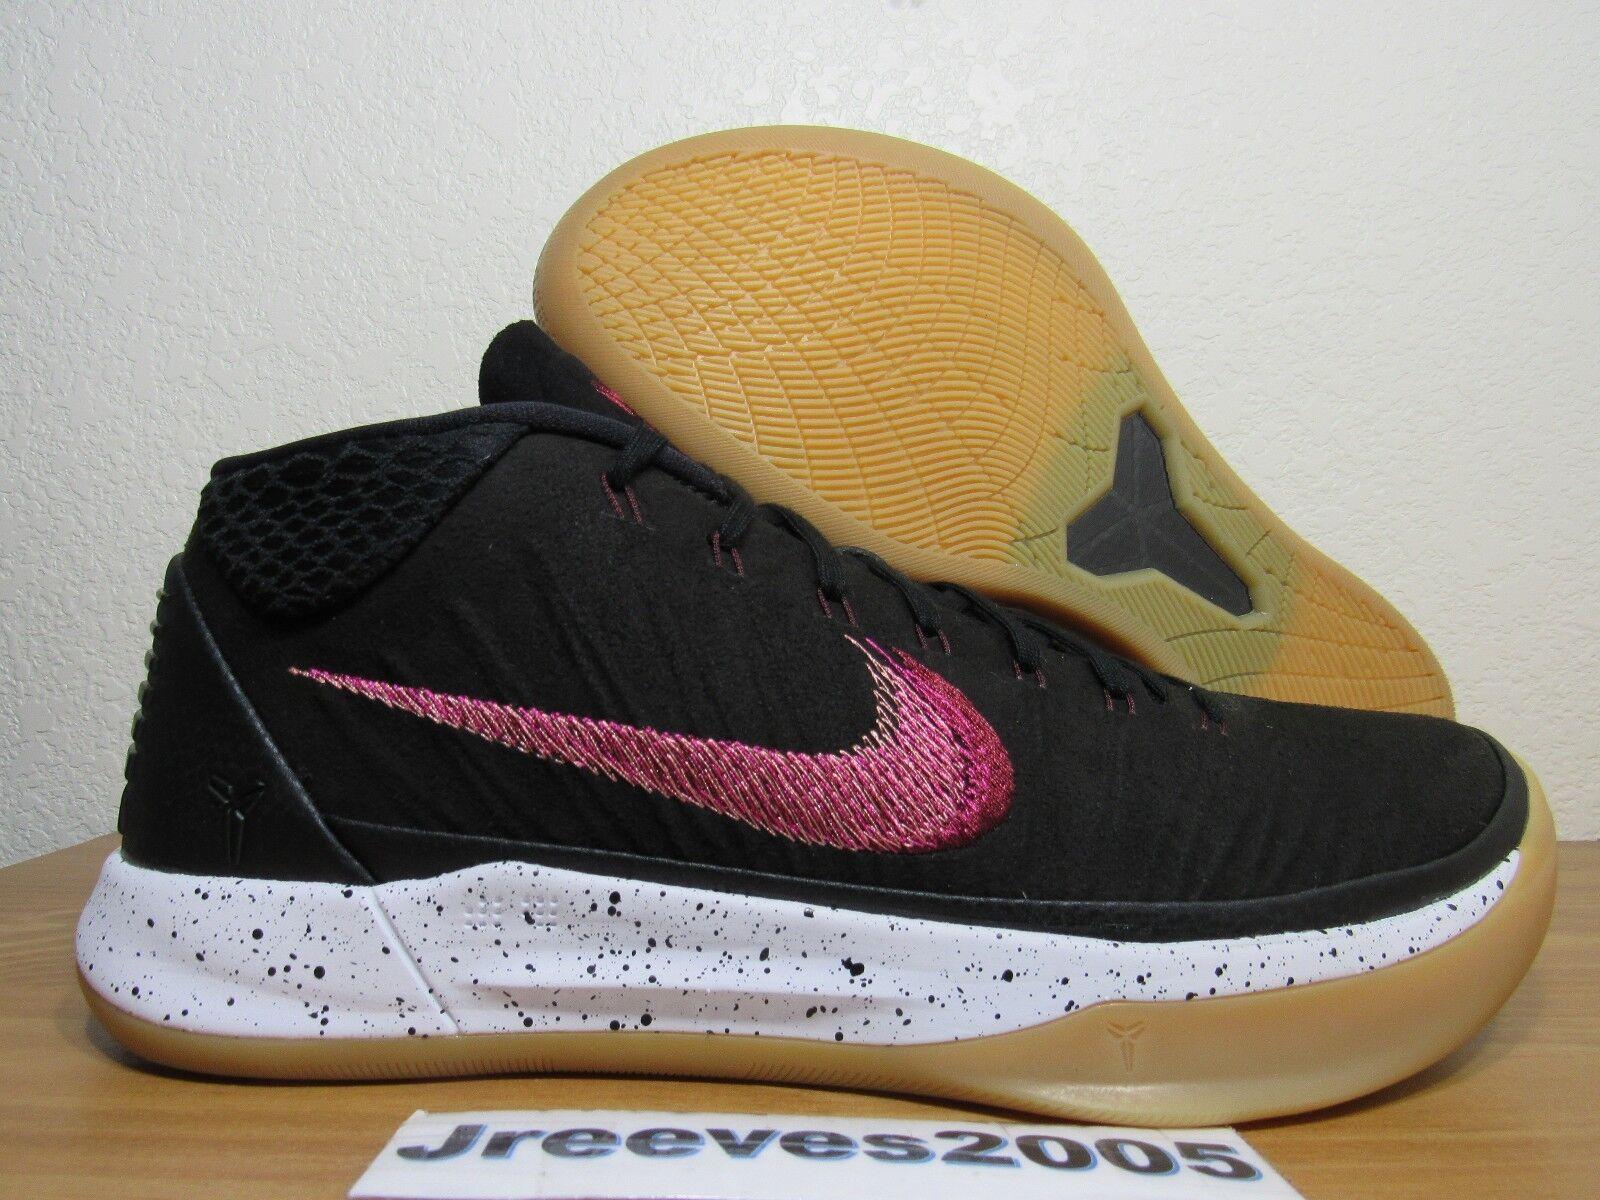 Kobe AD GENESIS Sz 10 100% Authentic Nike Retro A.D. Black Gum 922482 006